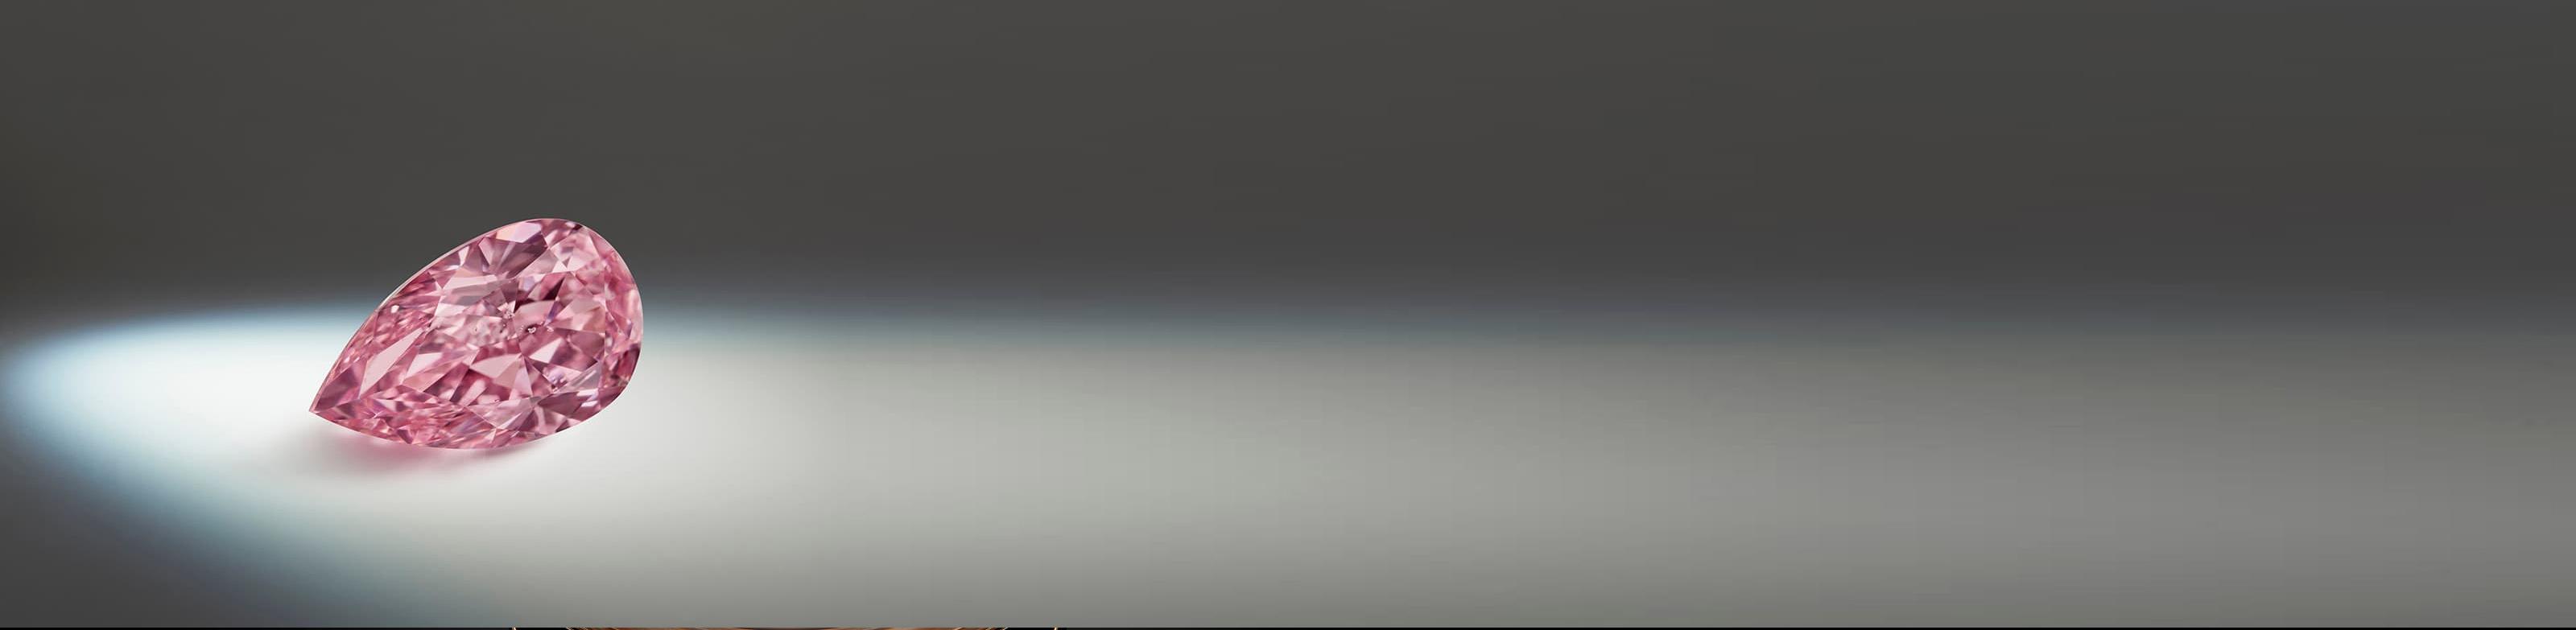 NEW ARGYLE PINK DIAMOND RING - JULY 2021 NEWS article hero image